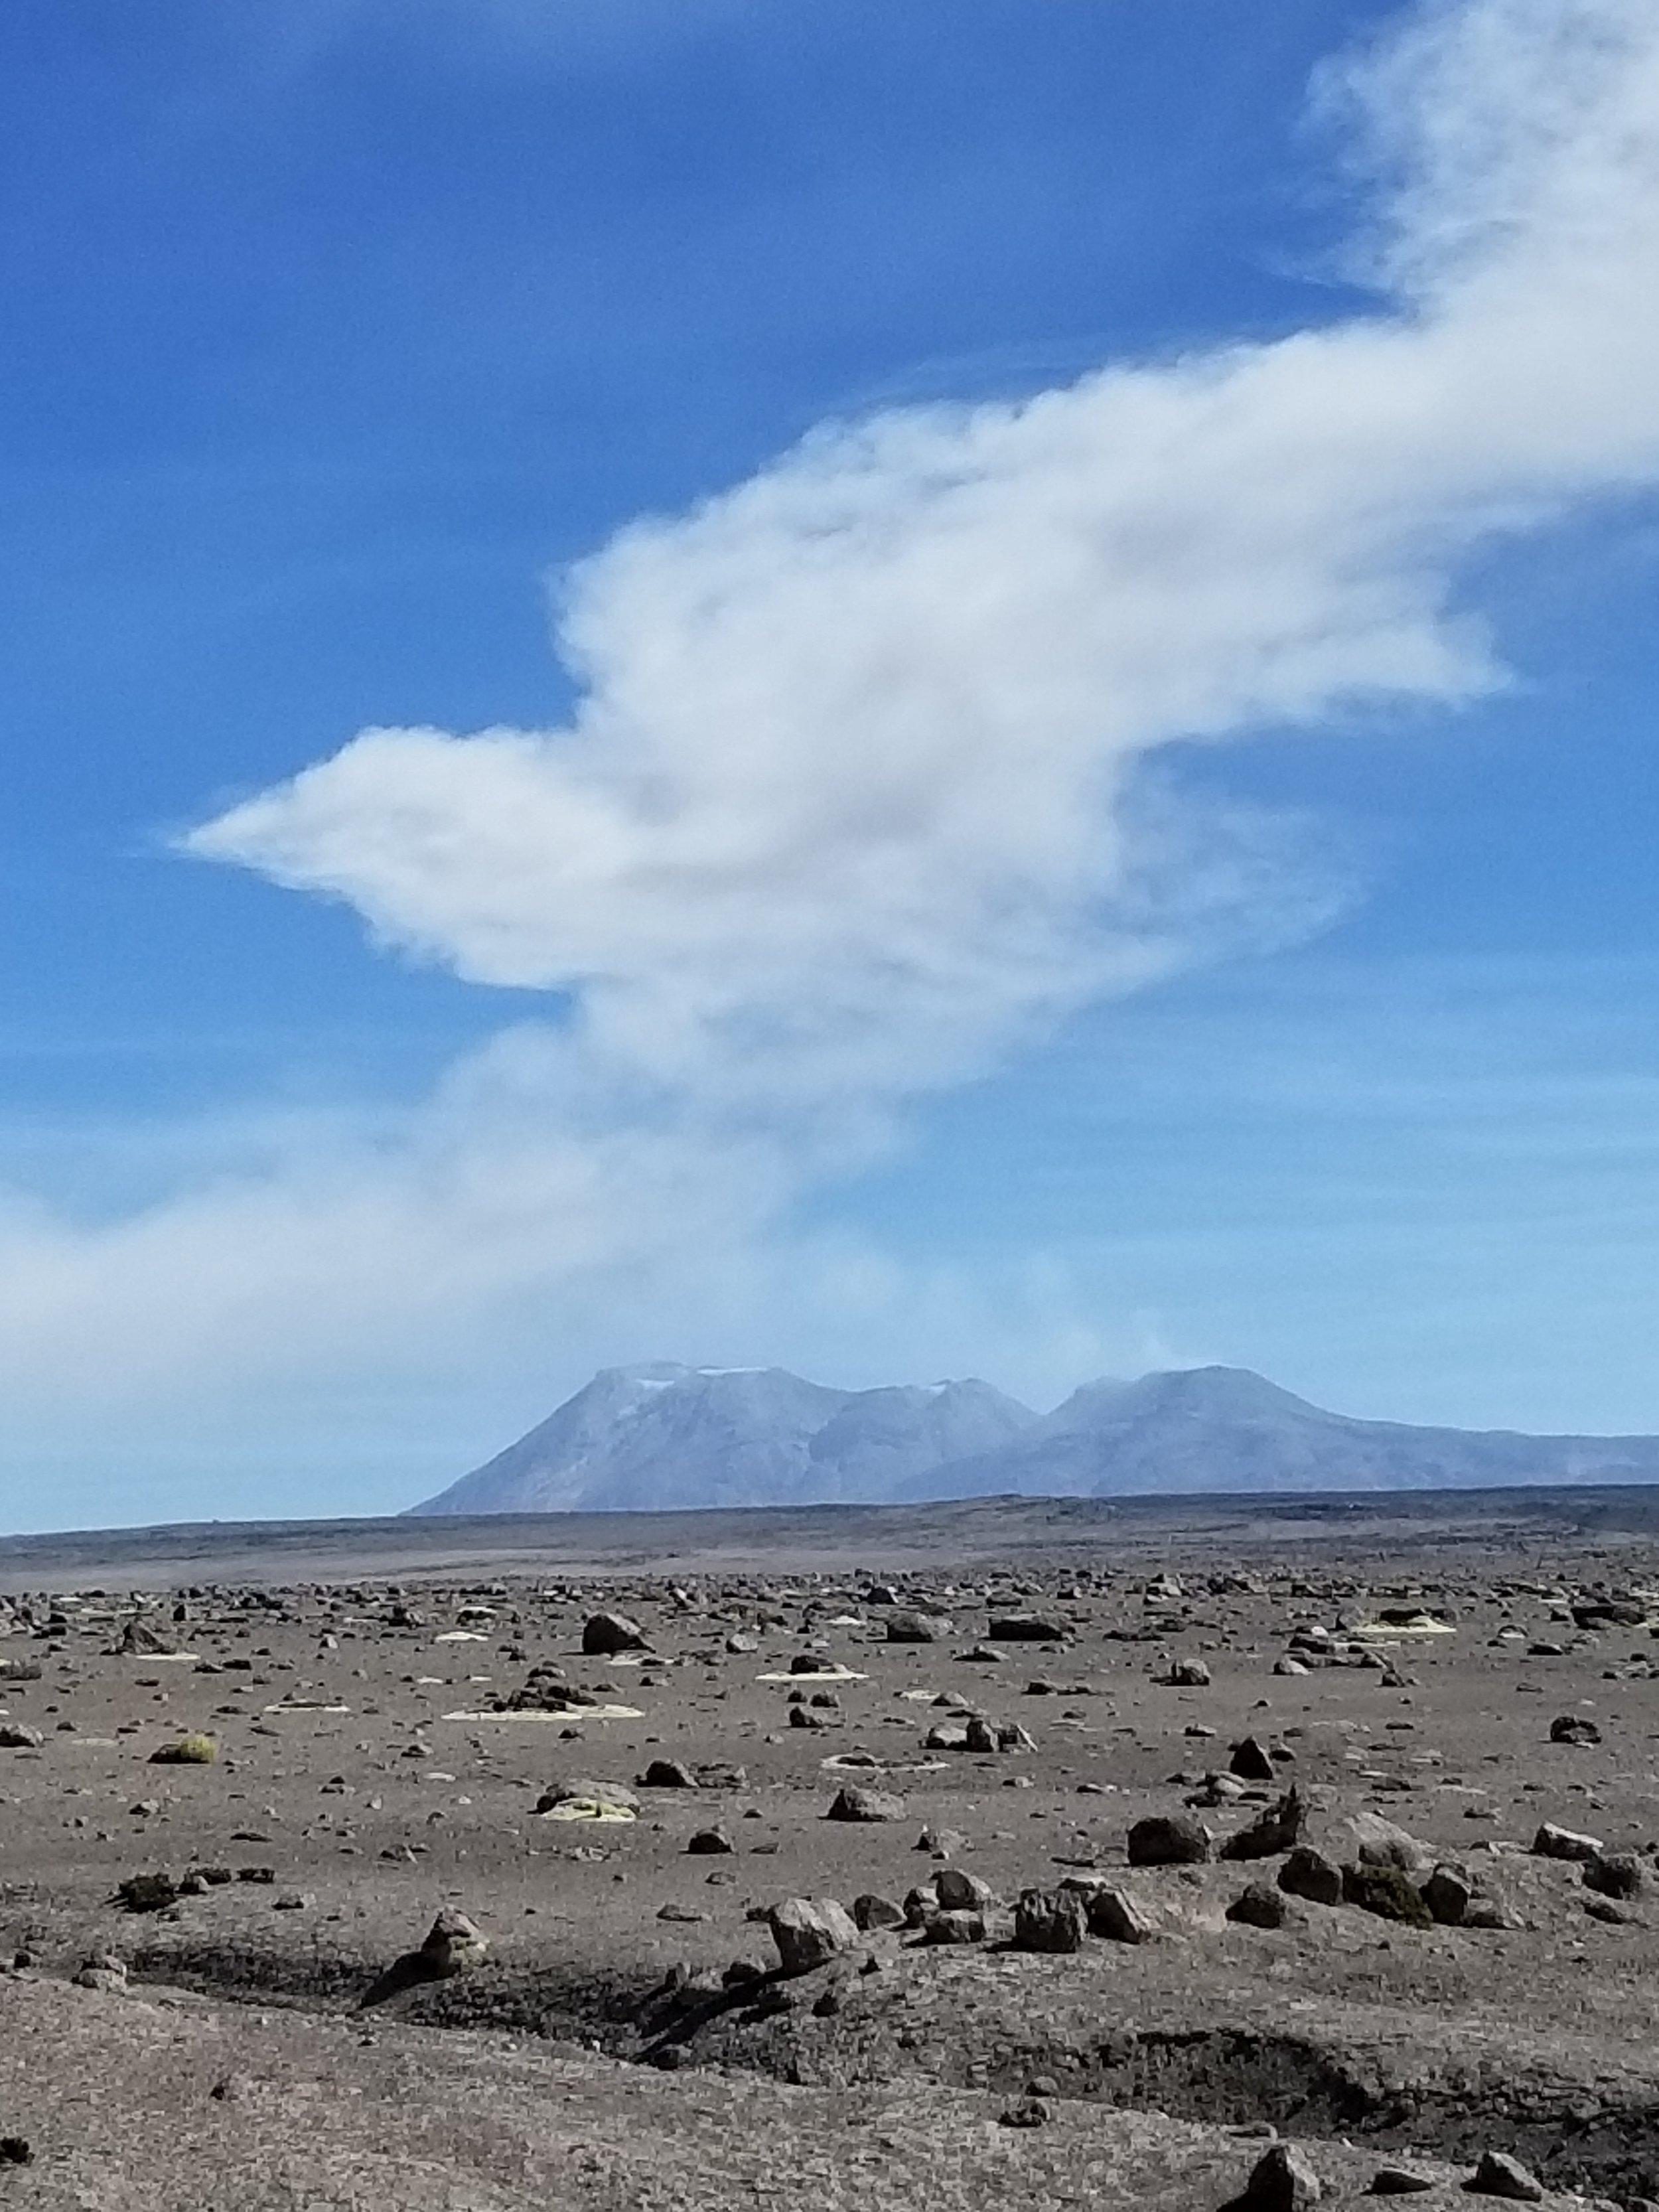 Sabancaya belching her volcanic mist near Patapampa Pass in southern Peru, June 2019.